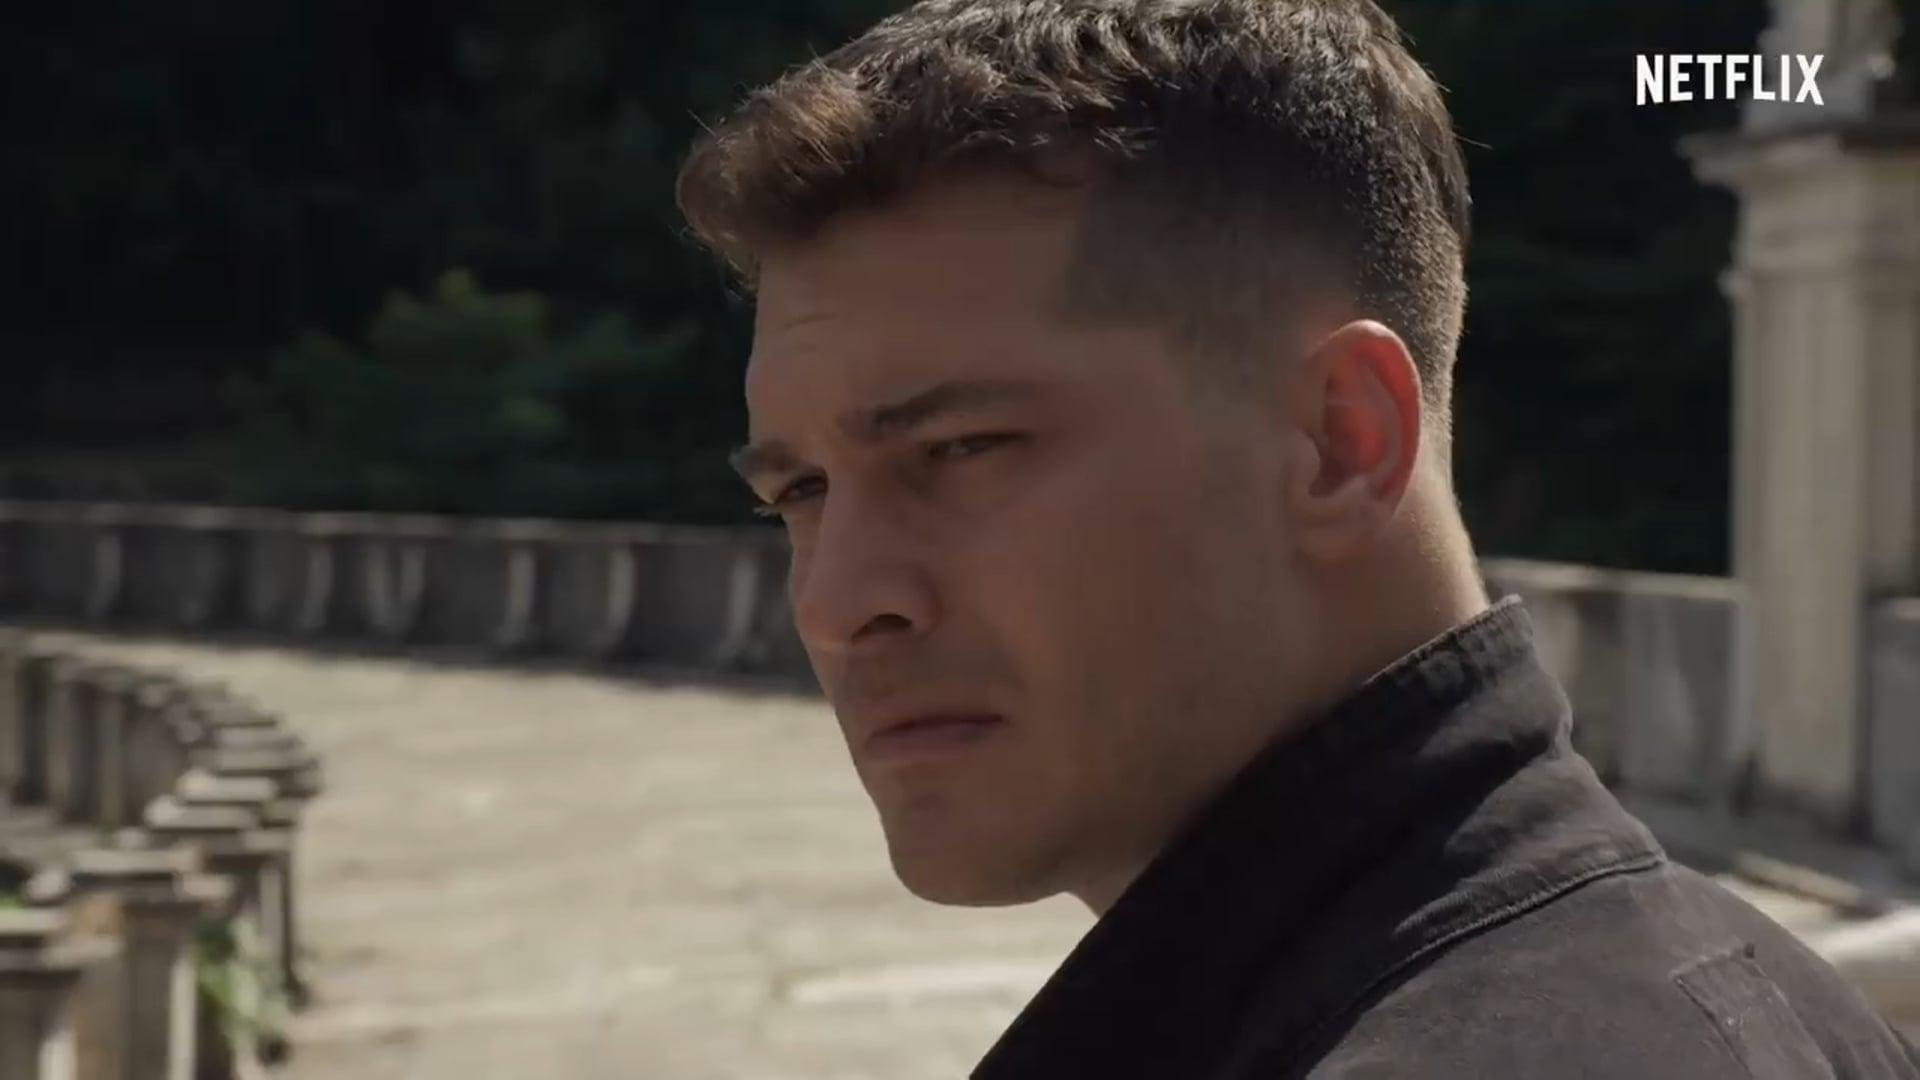 Netflix Series 'The Protector' - Season 2 - Official Trailer